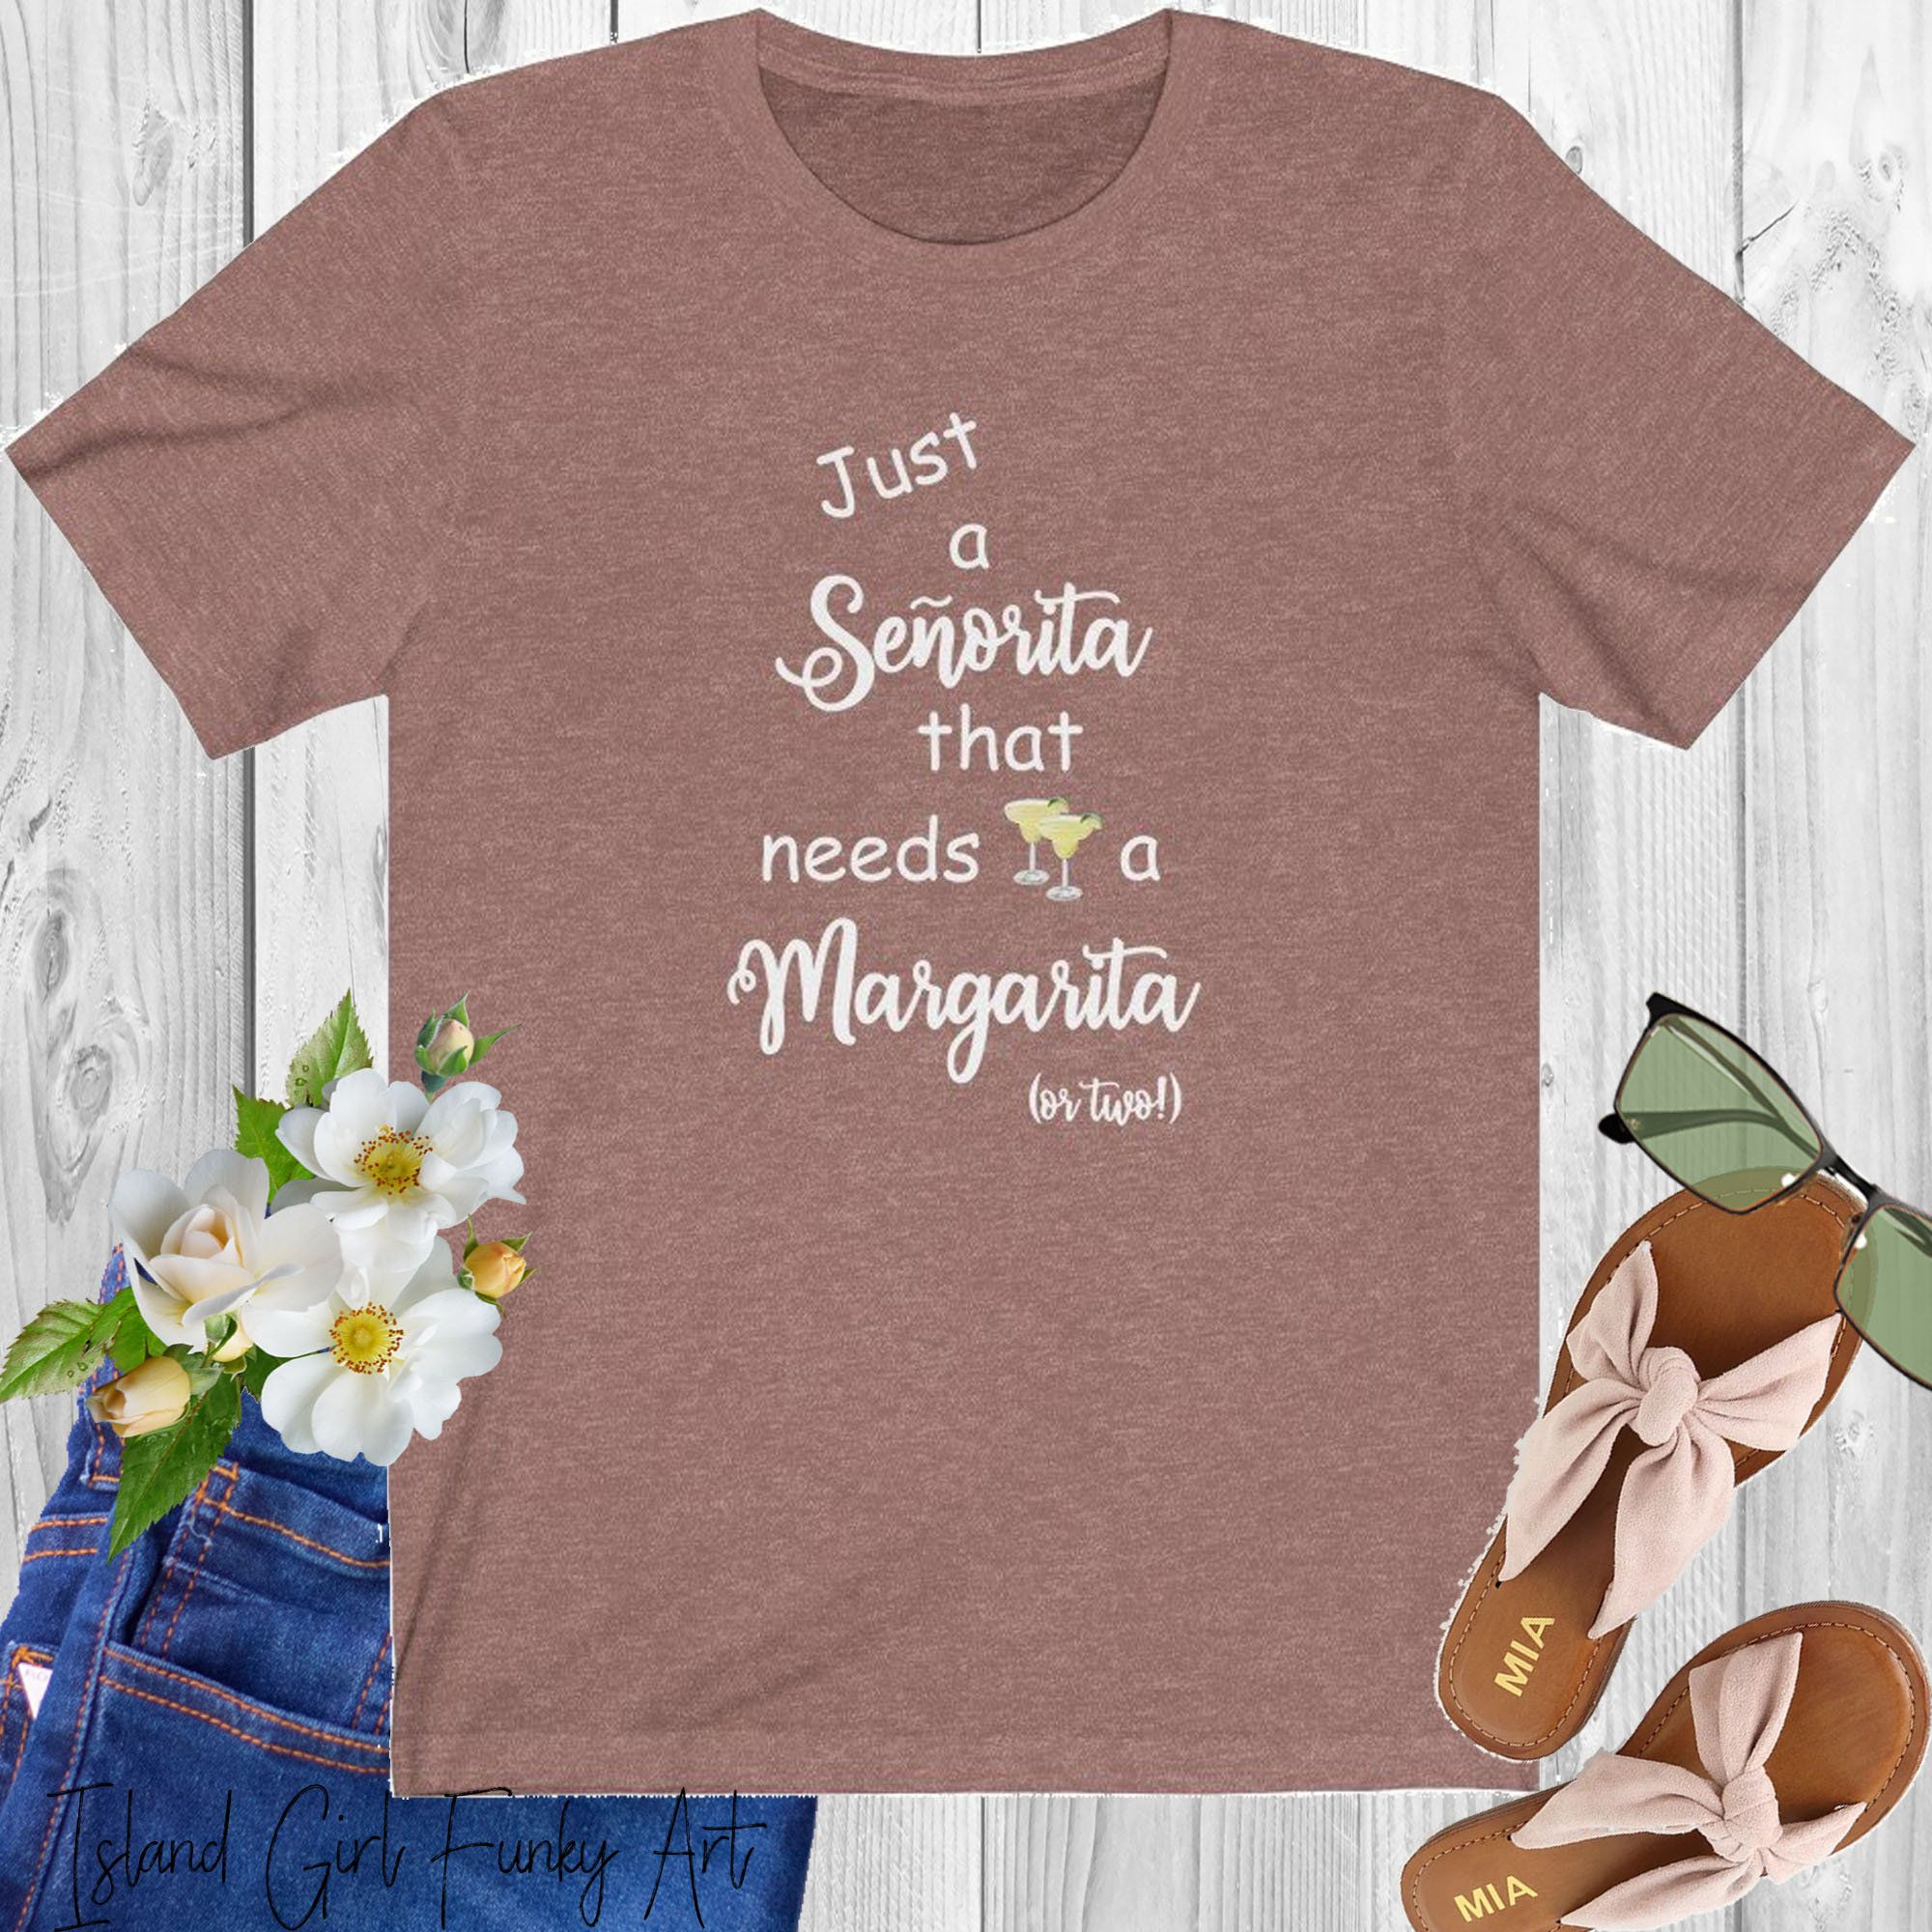 ed178178980 Cinco de Mayo T shirt This Senorita Needs a Margarita T shirt Unisex Jersey  Short Sleeve Tee by IslandGirlFunkyArt on Etsy